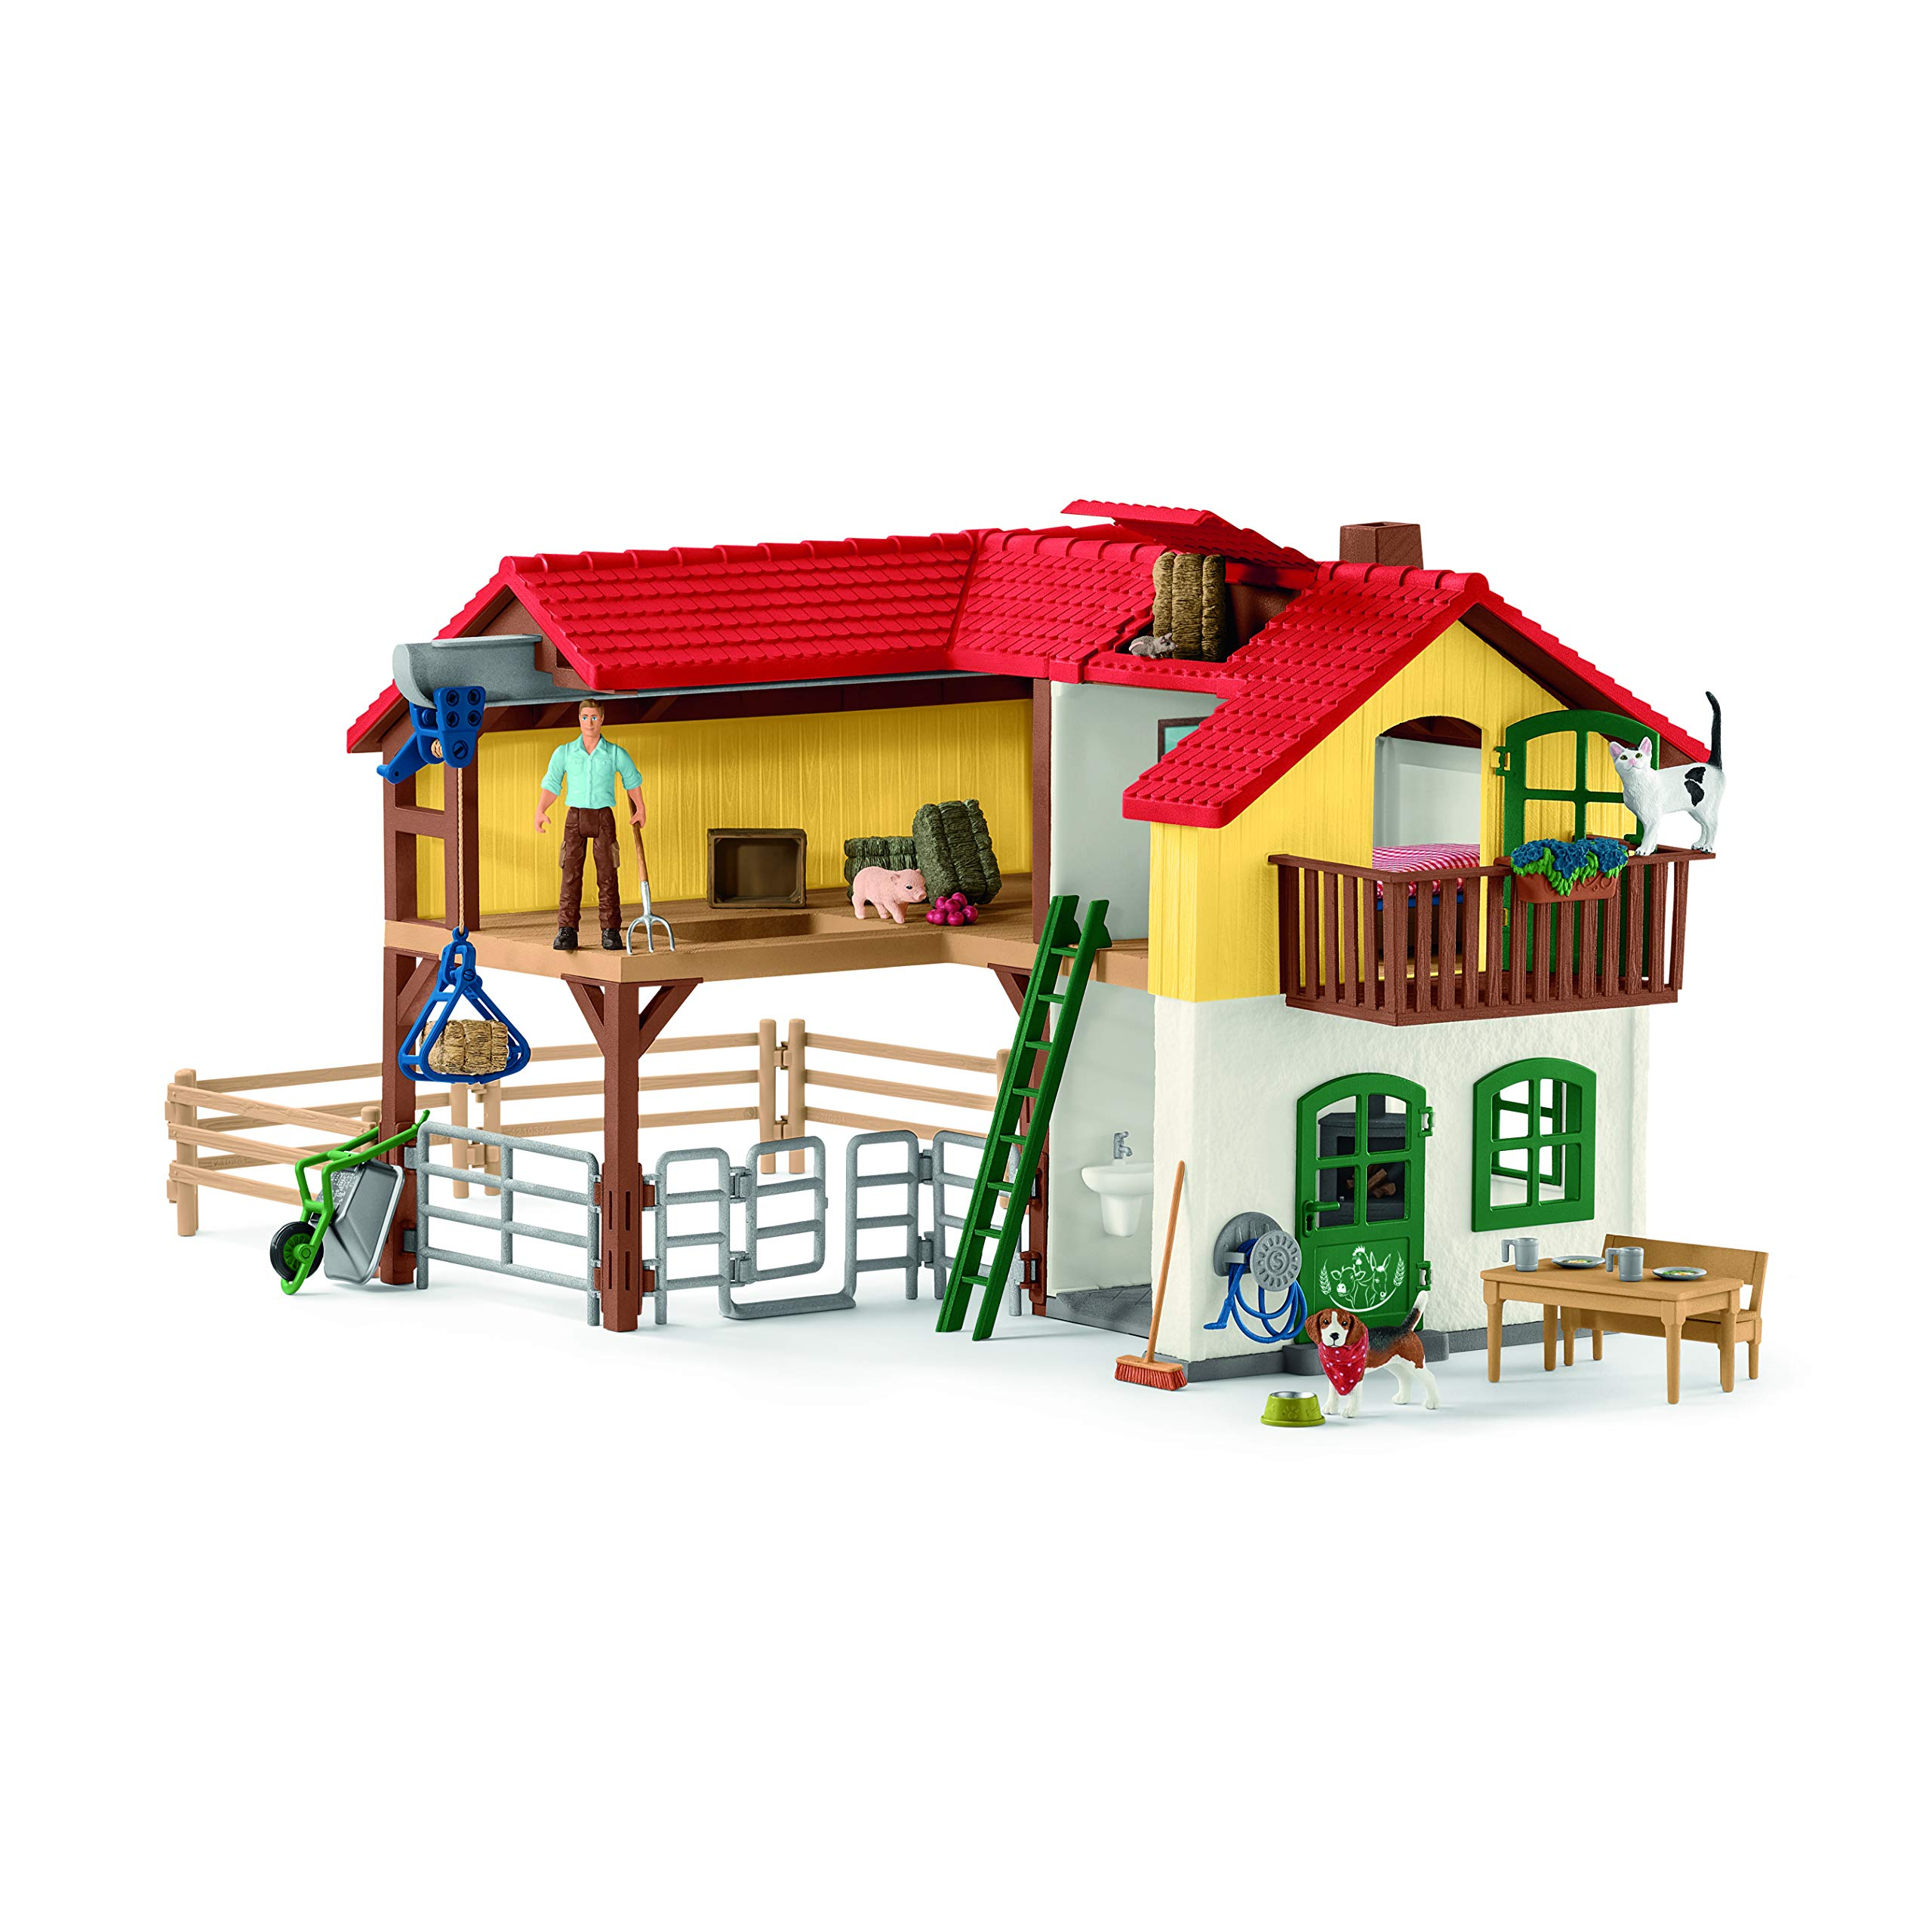 Schleich Large Farm House by Schleich (Image #16)